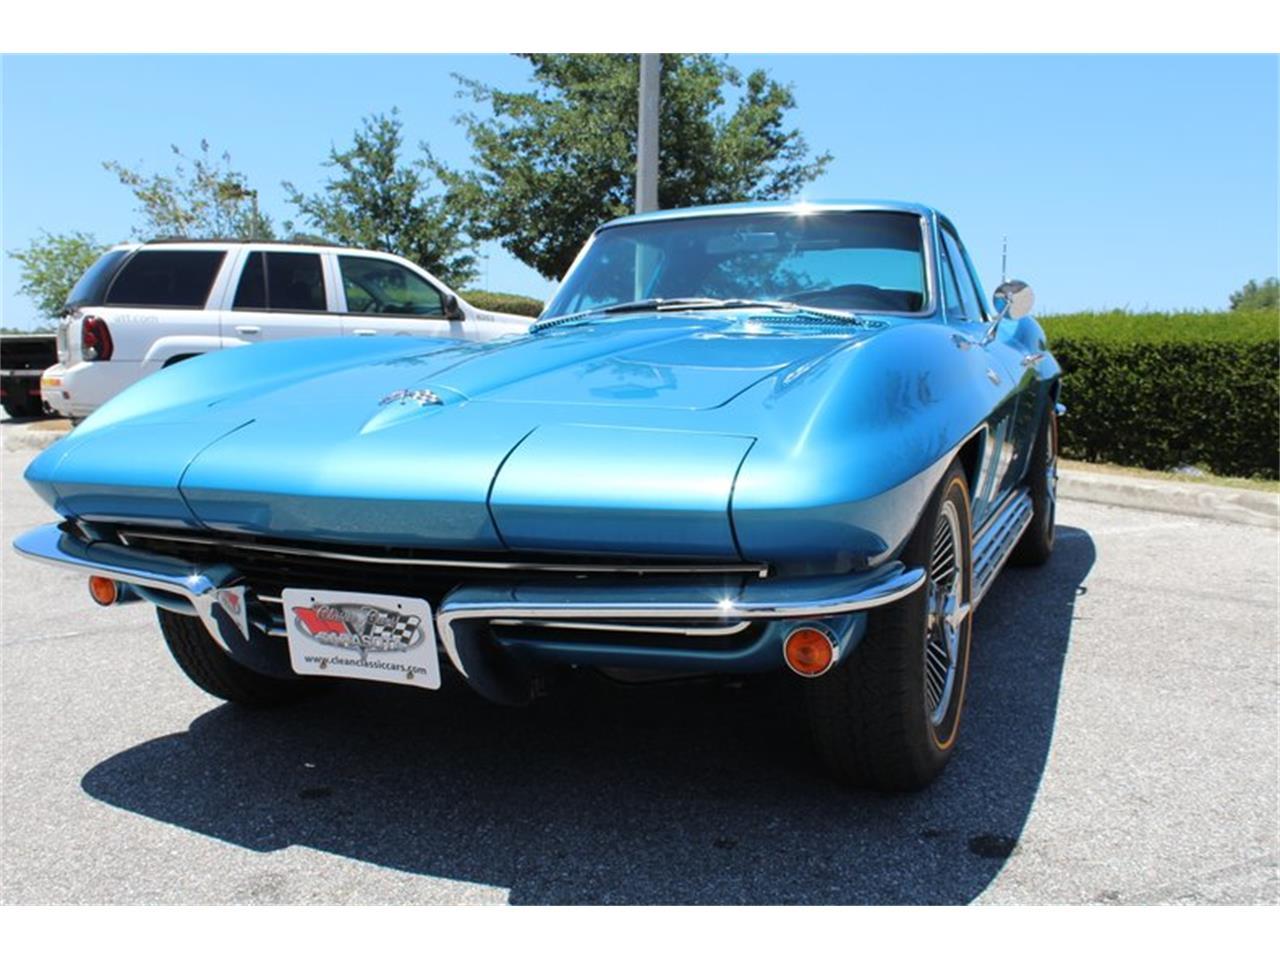 Large Picture of '65 Chevrolet Corvette located in Sarasota Florida - $69,500.00 - QSRR